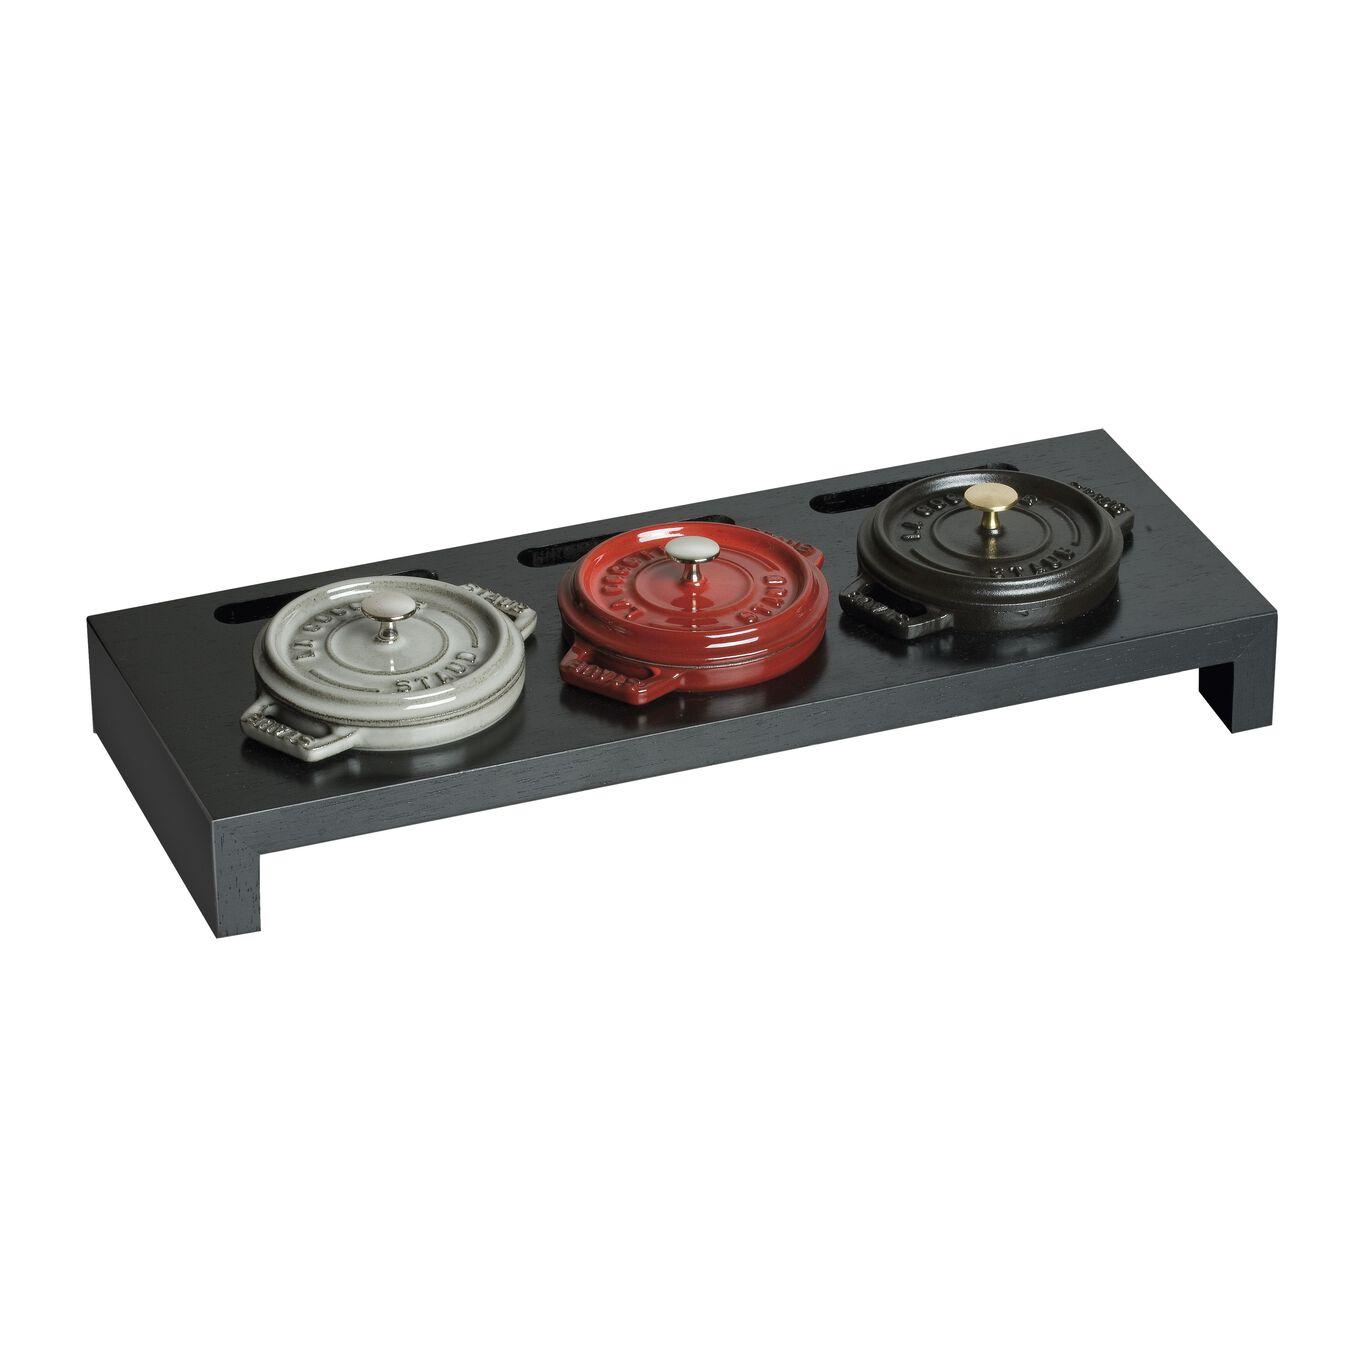 Fiber wood, Mini Cocotte Stand, black matte,,large 2